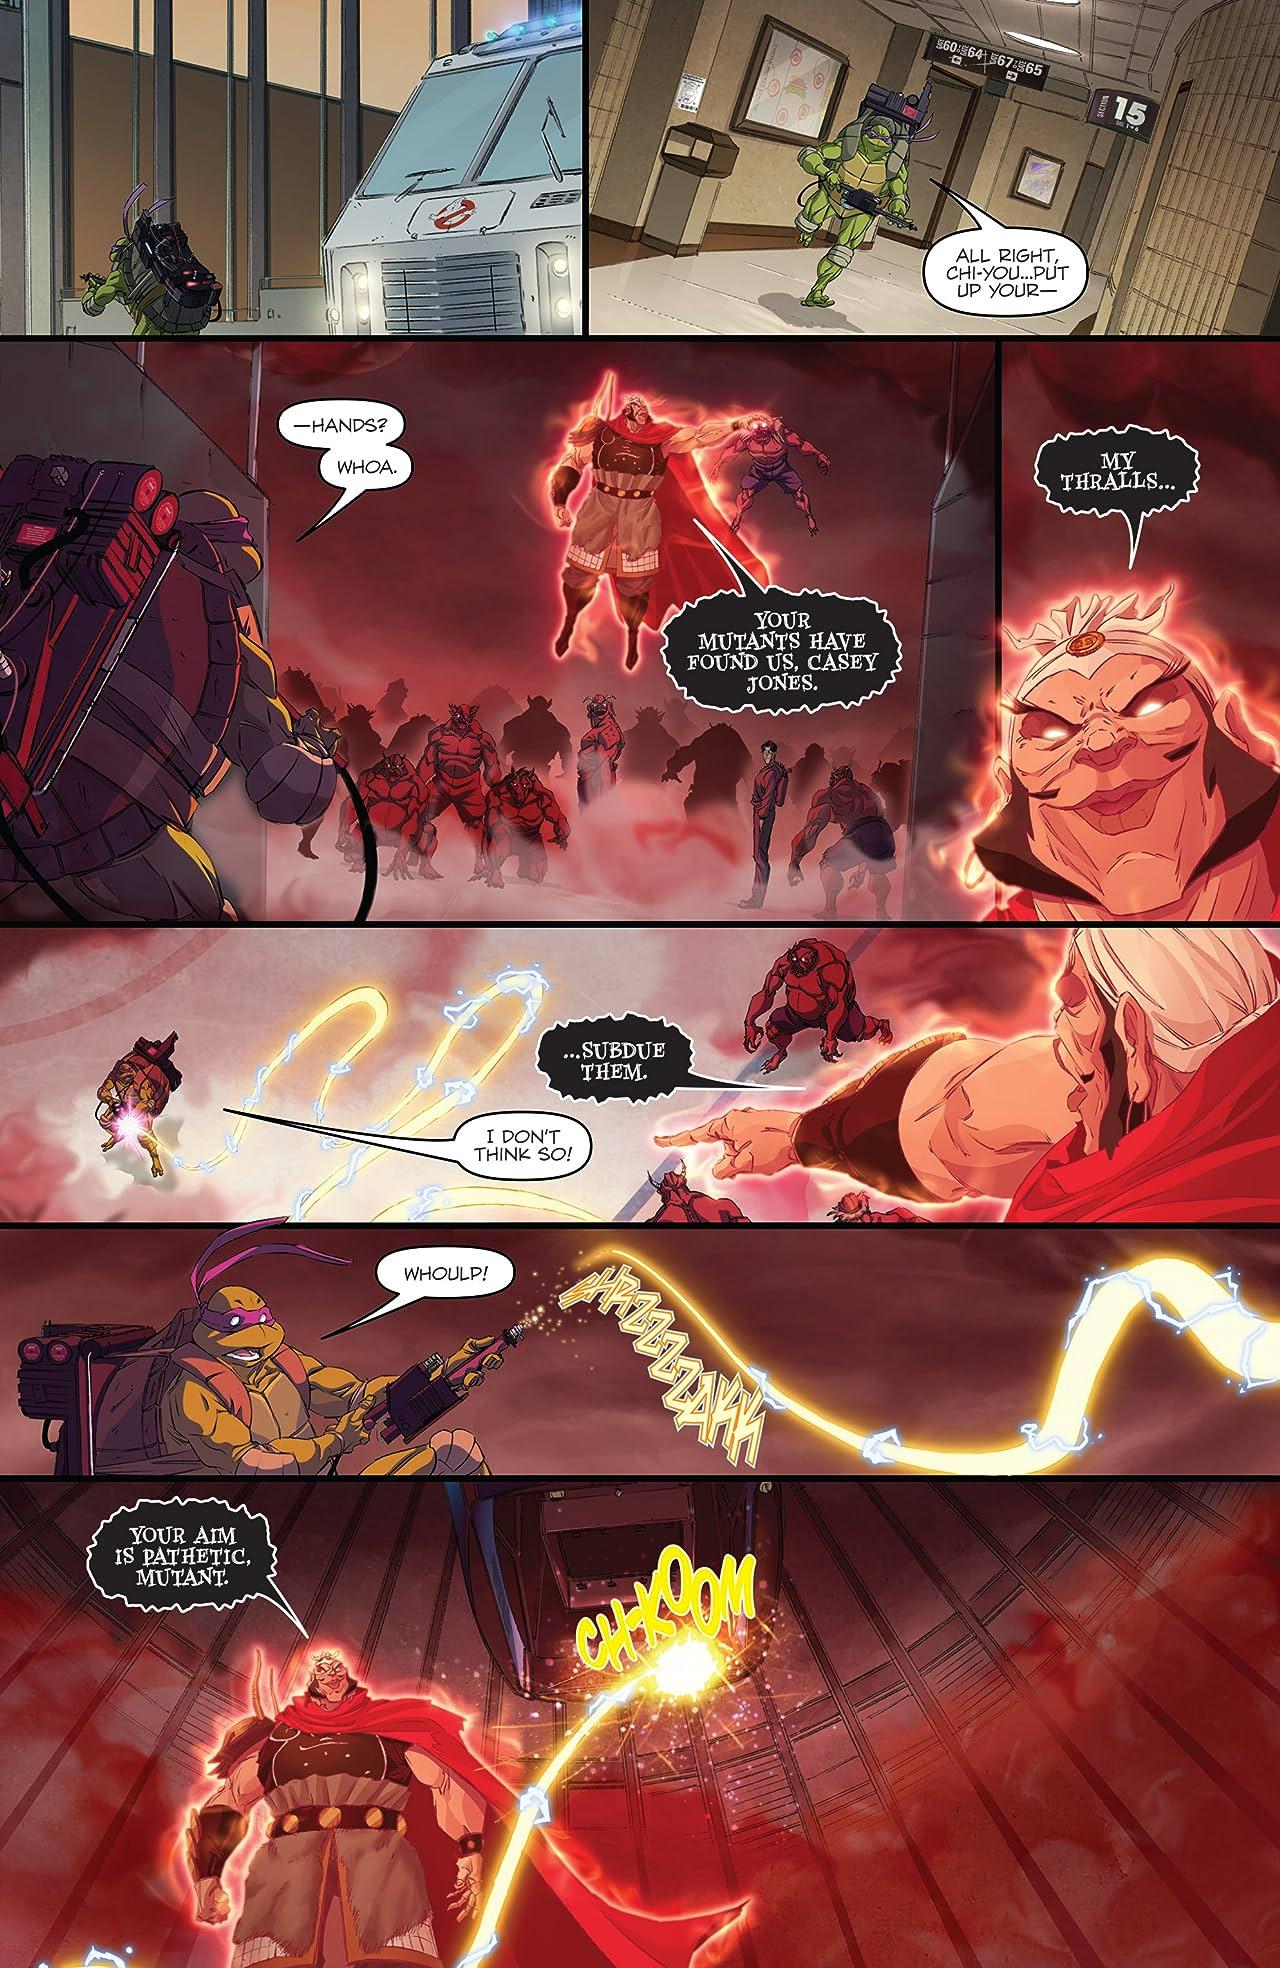 Teenage Mutant Ninja Turtles/Ghostbusters #3 (of 4)